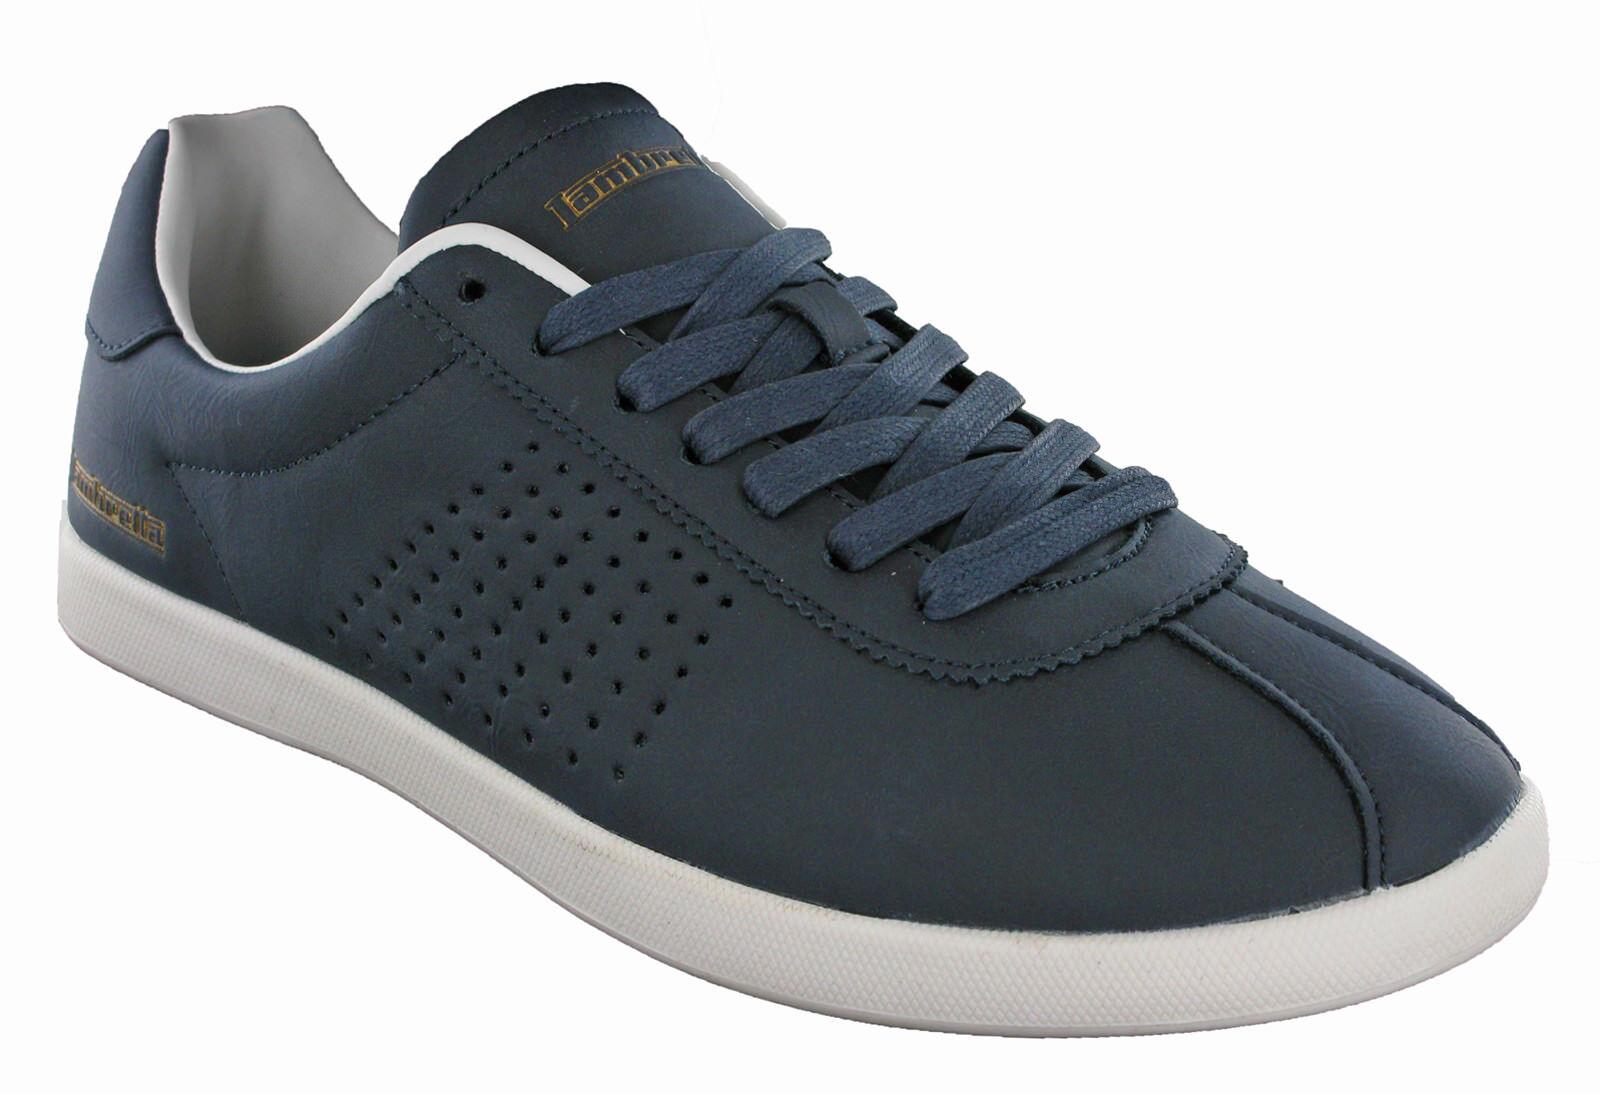 Lambretta Mens Trainers Casual Gazzman Sports Lace Memory Foam Gazzman Casual Shoes UK 7 - 12 27dd77